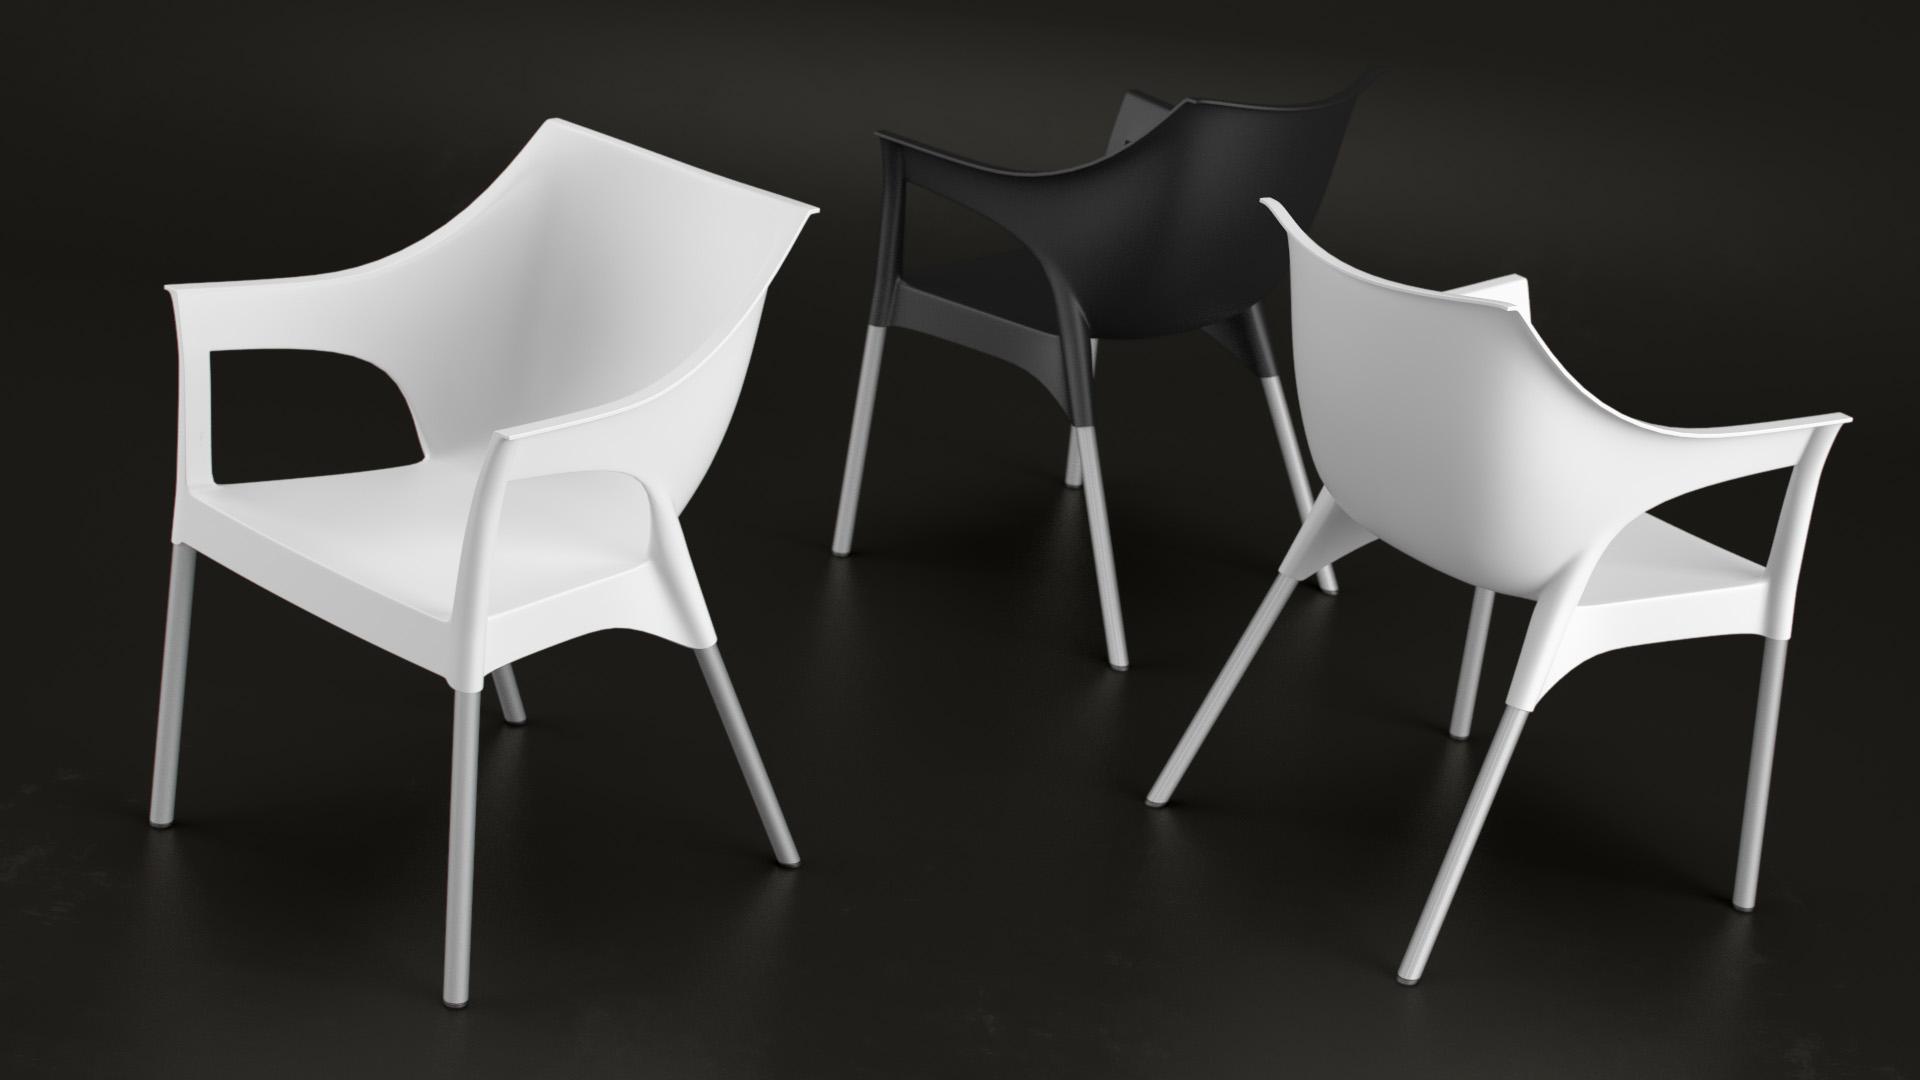 Pole_Chair_BlackSet_01_V1.01_0003